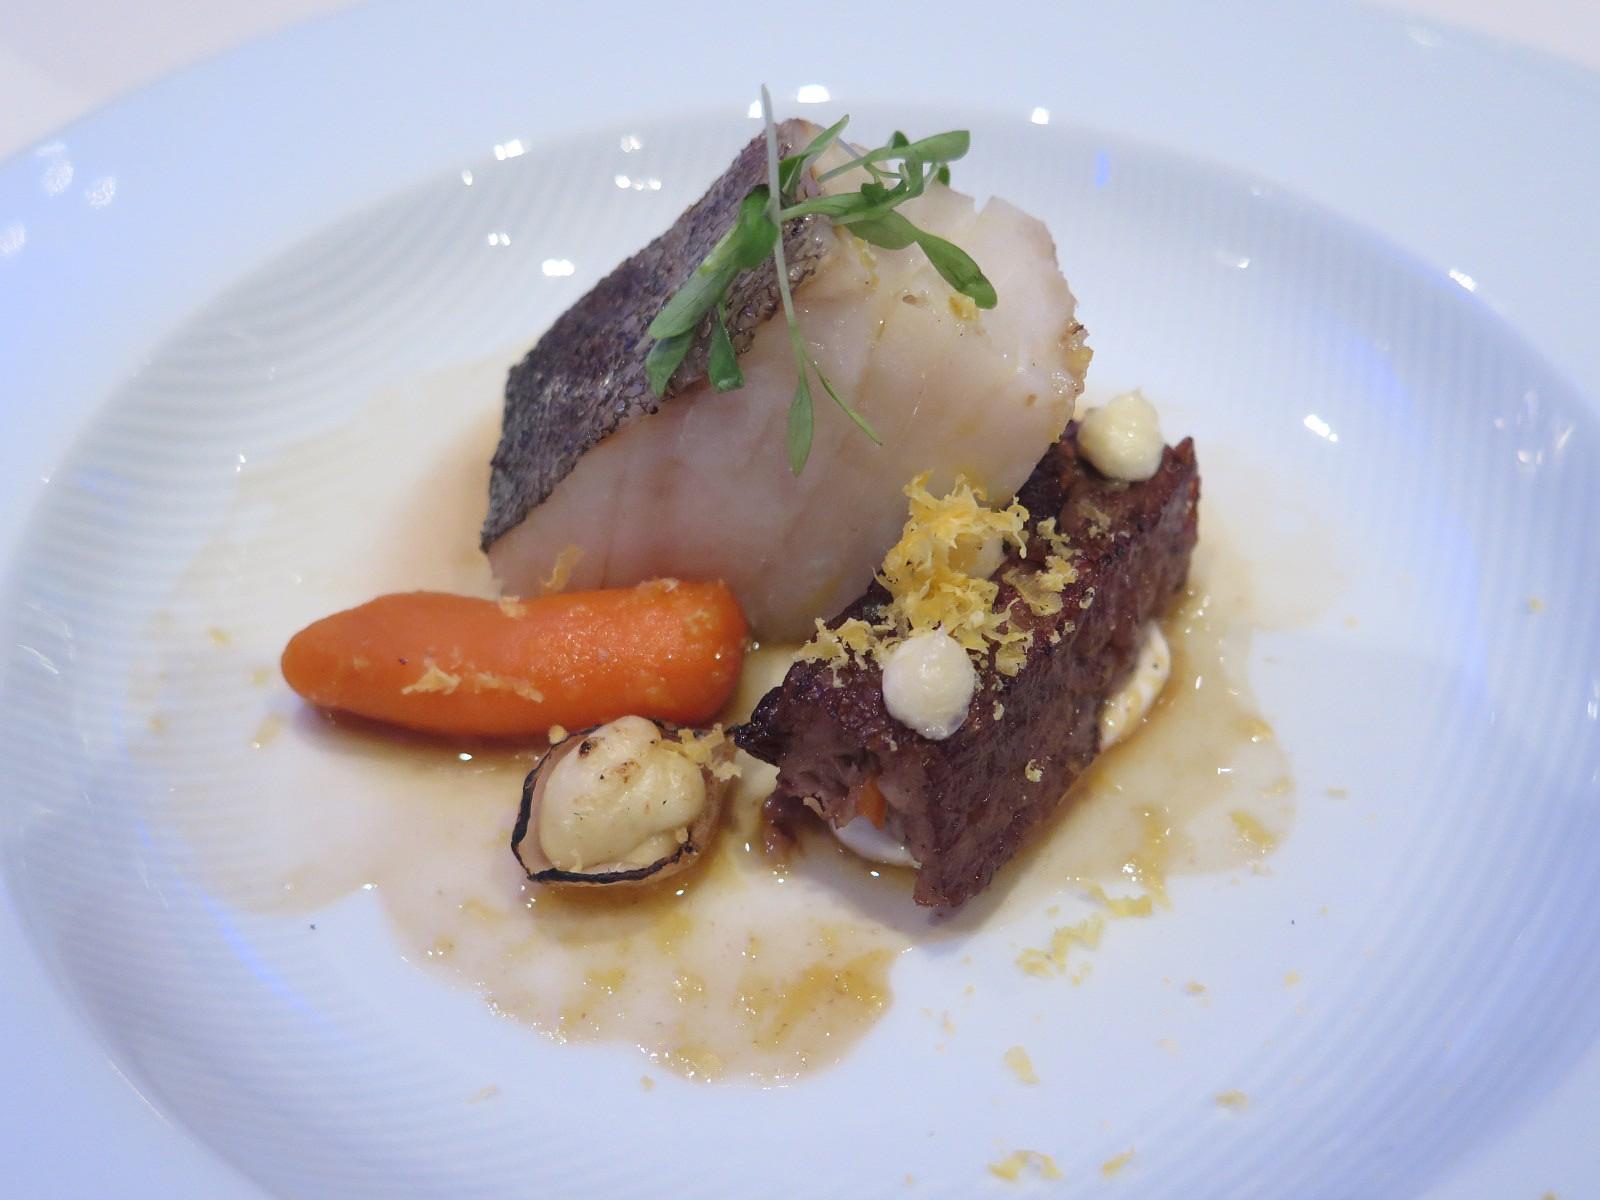 Francisco Miranda – Bacalhau salgado seco da Noruega, terrina de porco e gema de ovo curada